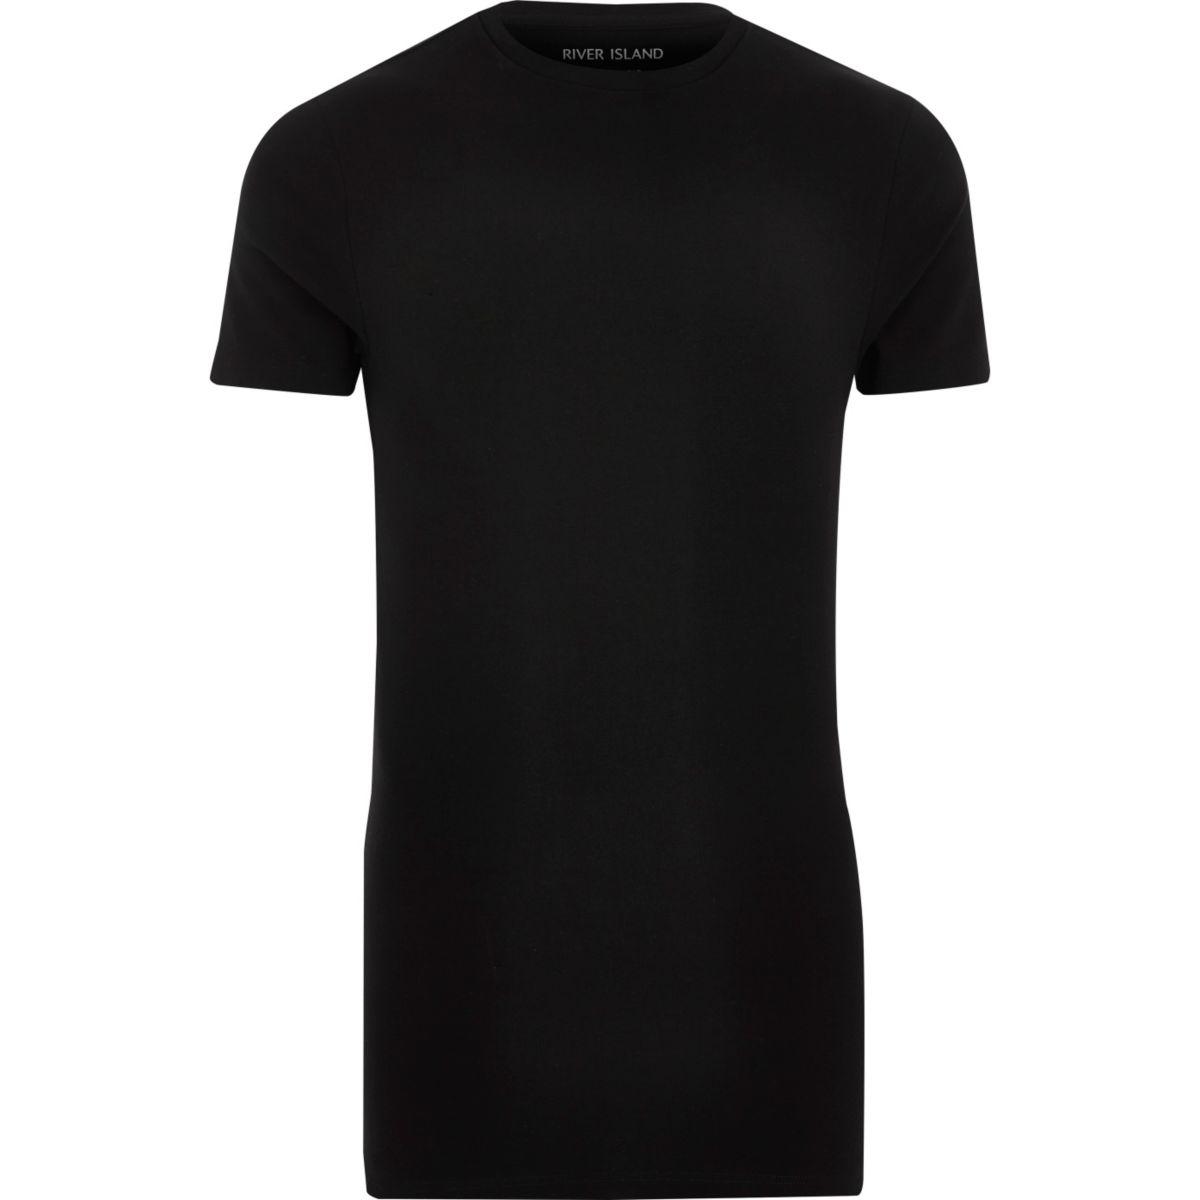 Black longline muscle fit T-shirt